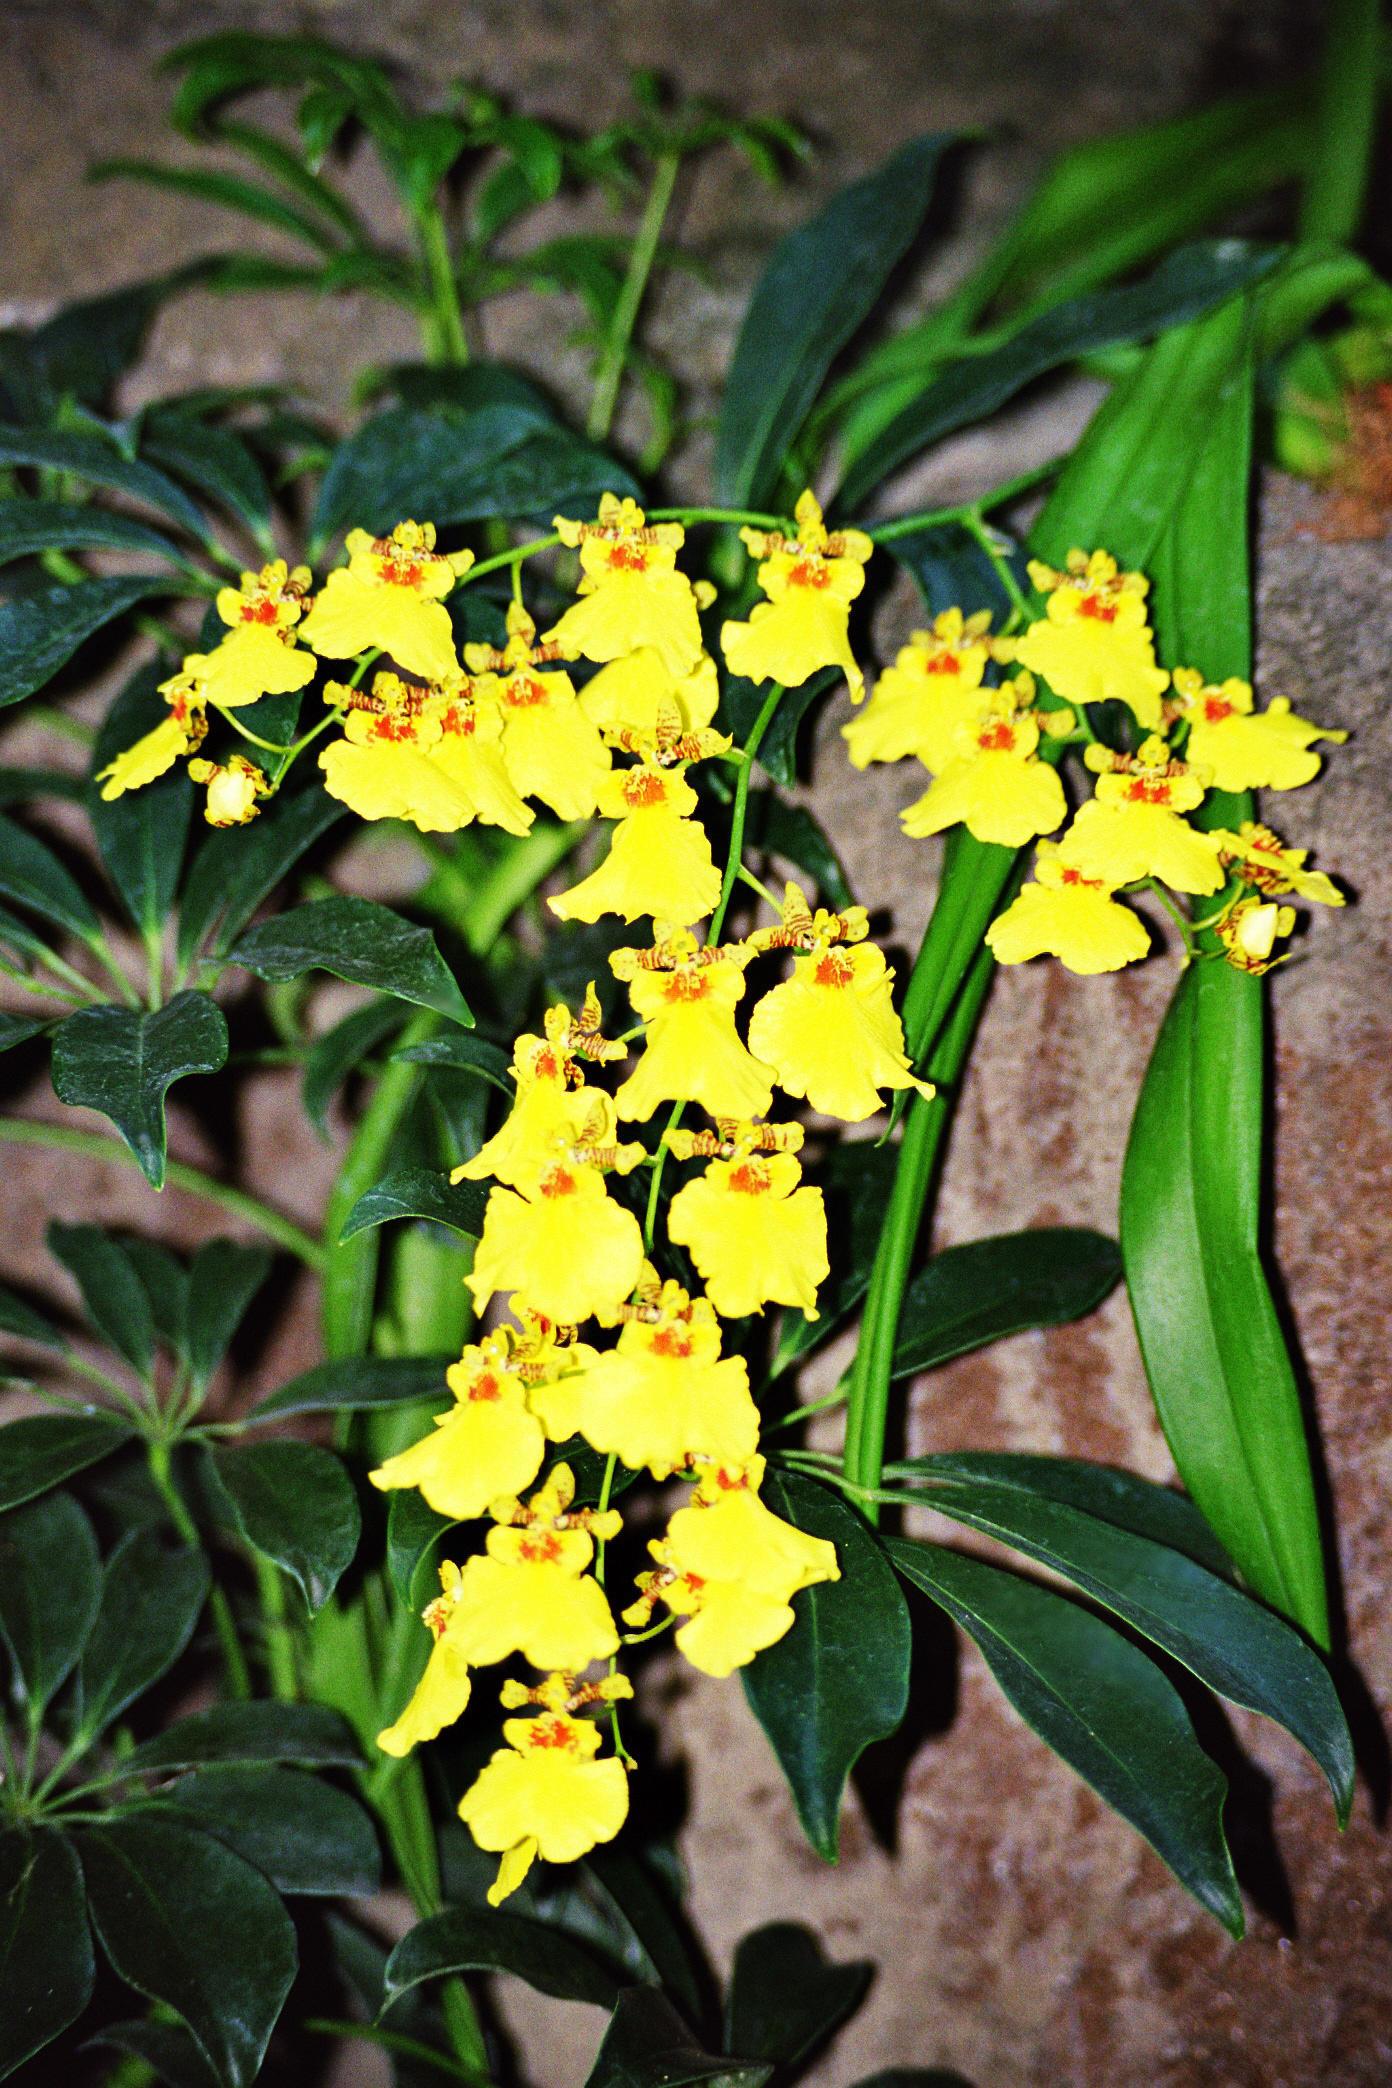 Oncidium Gower Ramsey, Orchid,  Bushgarden, Tampa Bay, Florida